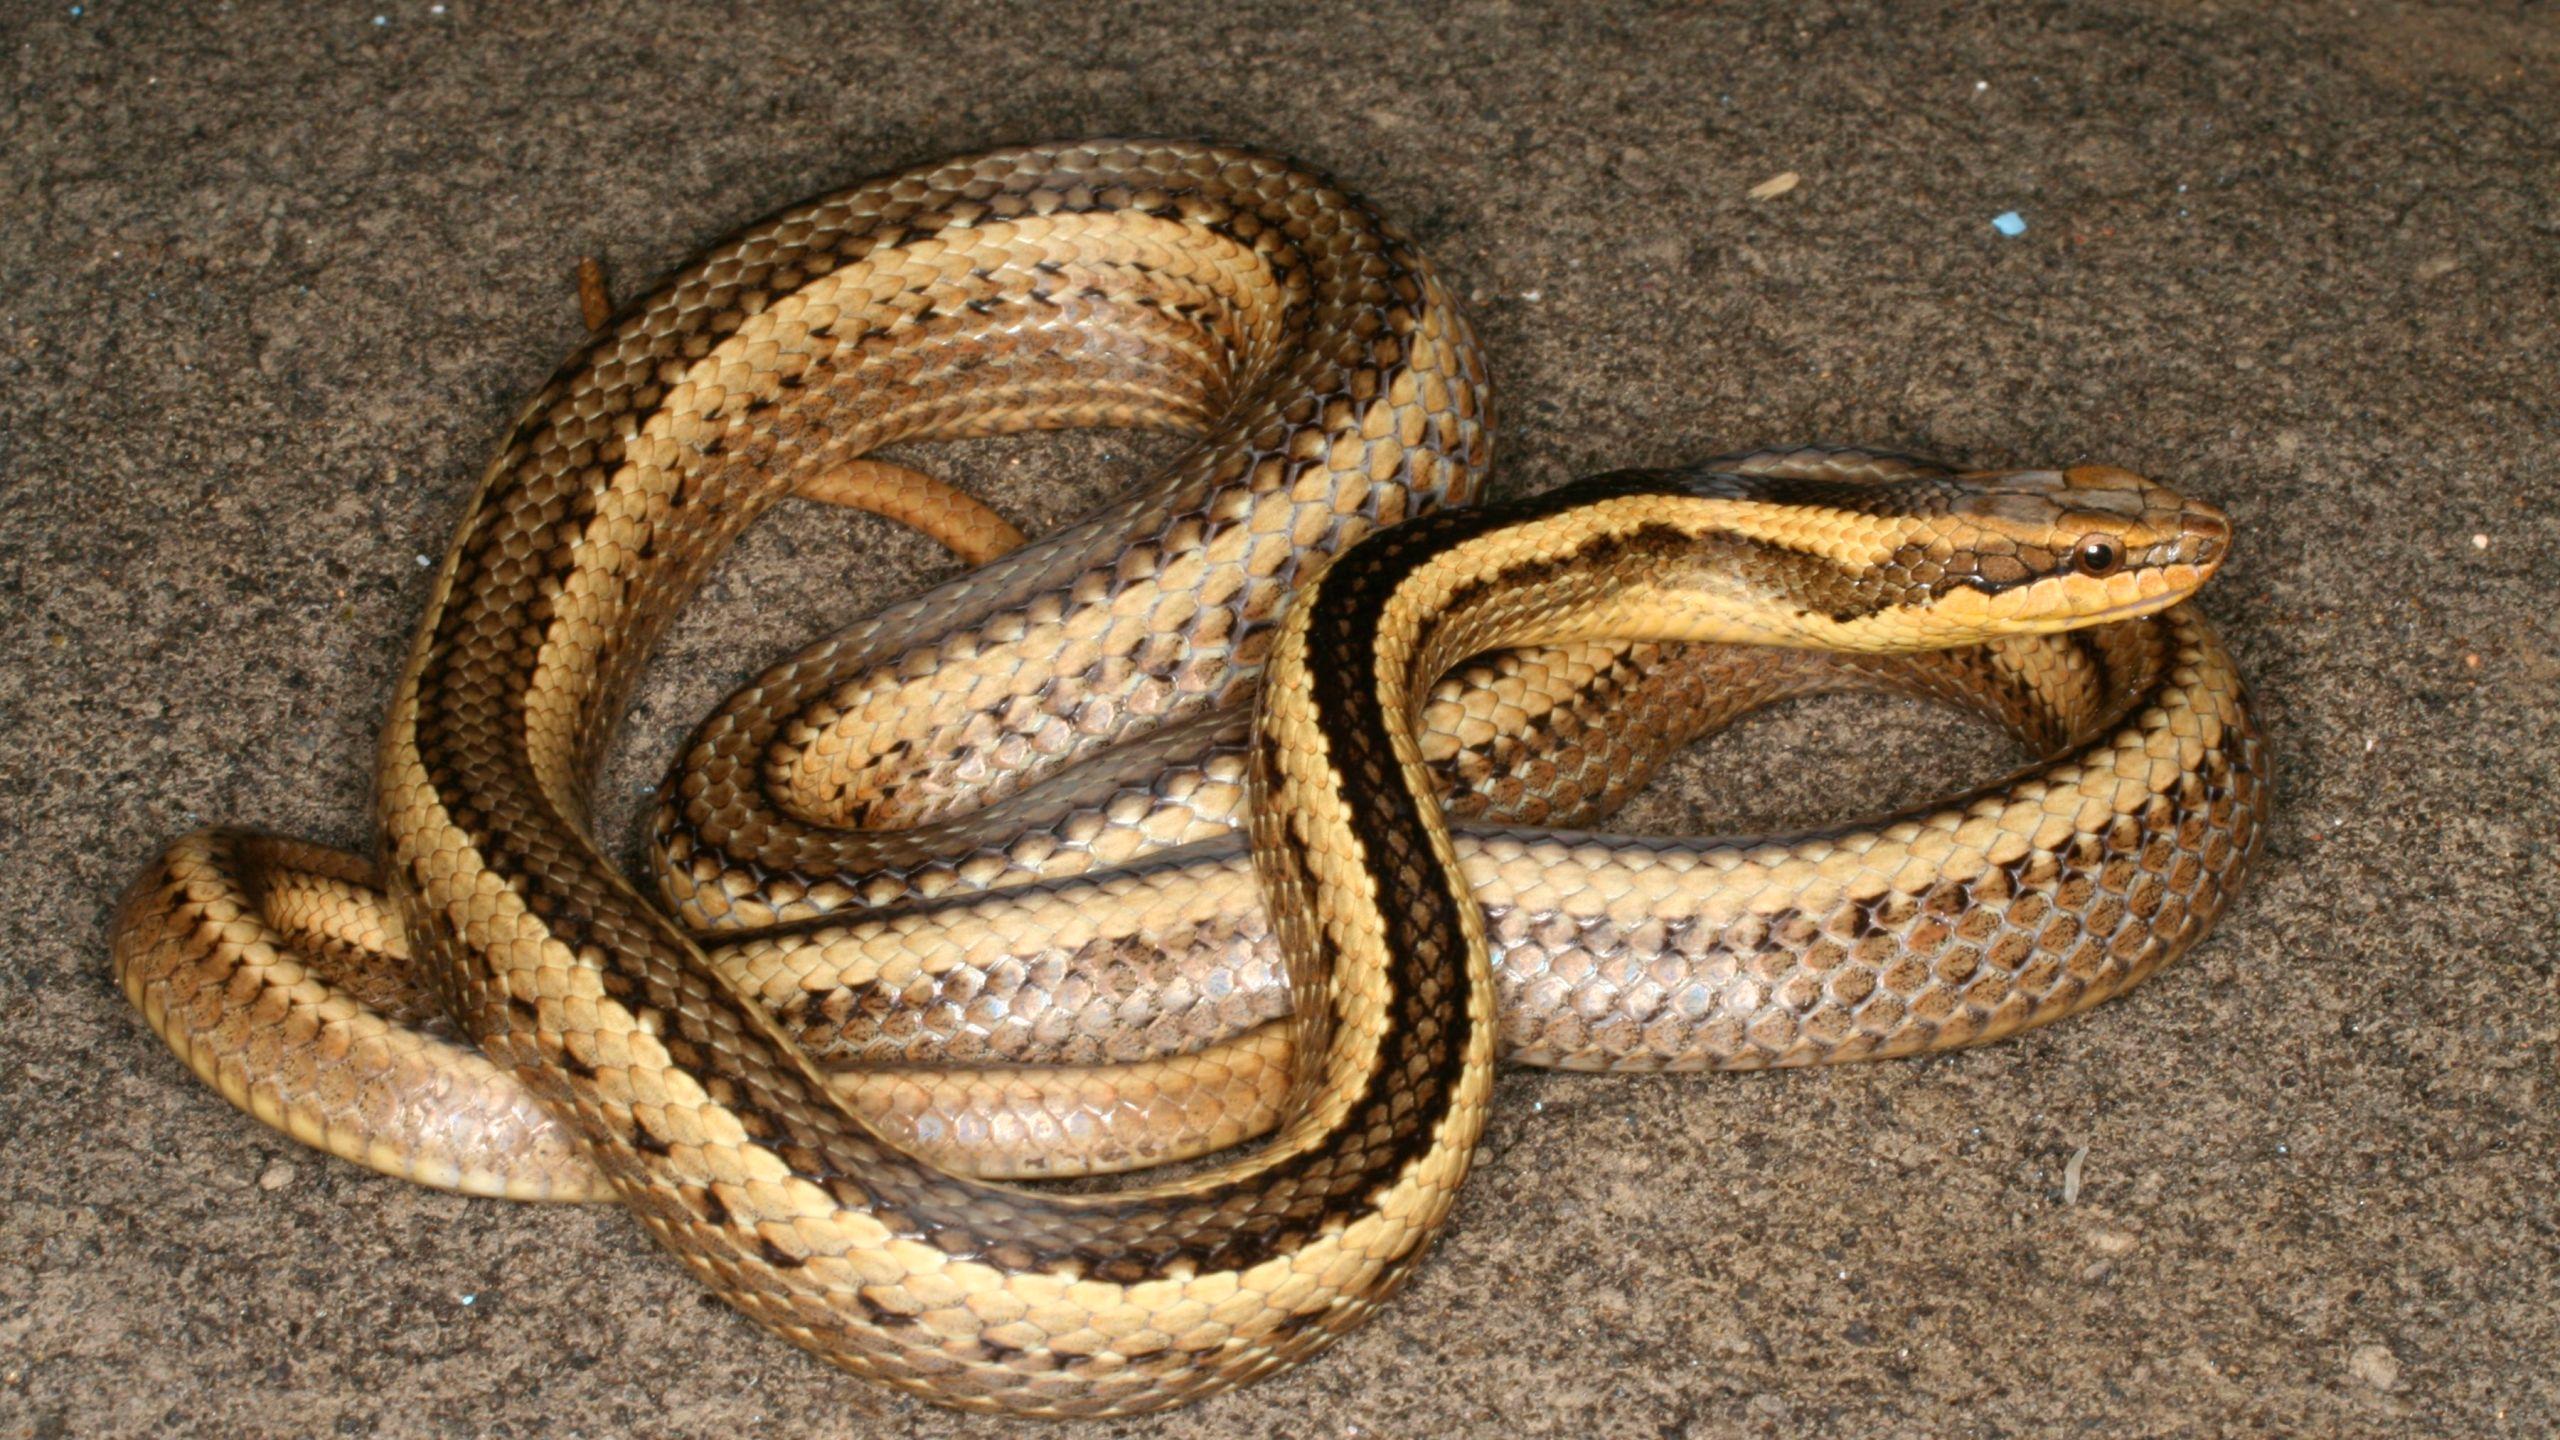 Snake names honor Darwin, fire god, Louisiana professor